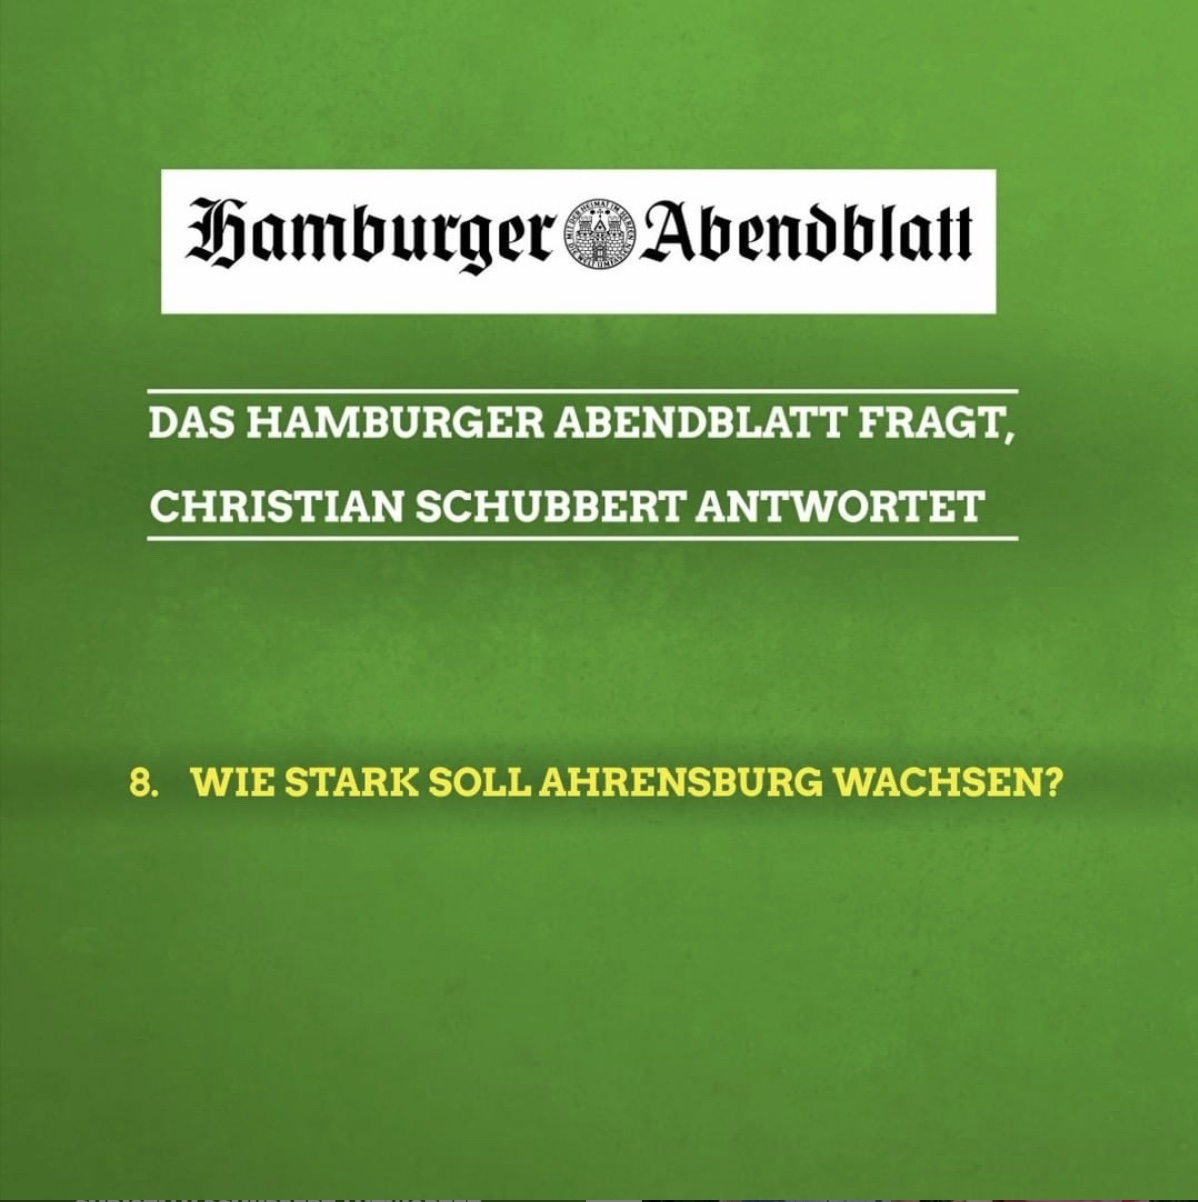 Das Hamburger Abendblatt fragt, Christian Schubbert antwortet: 8 Wie stark soll Ahrensburg wachsen?